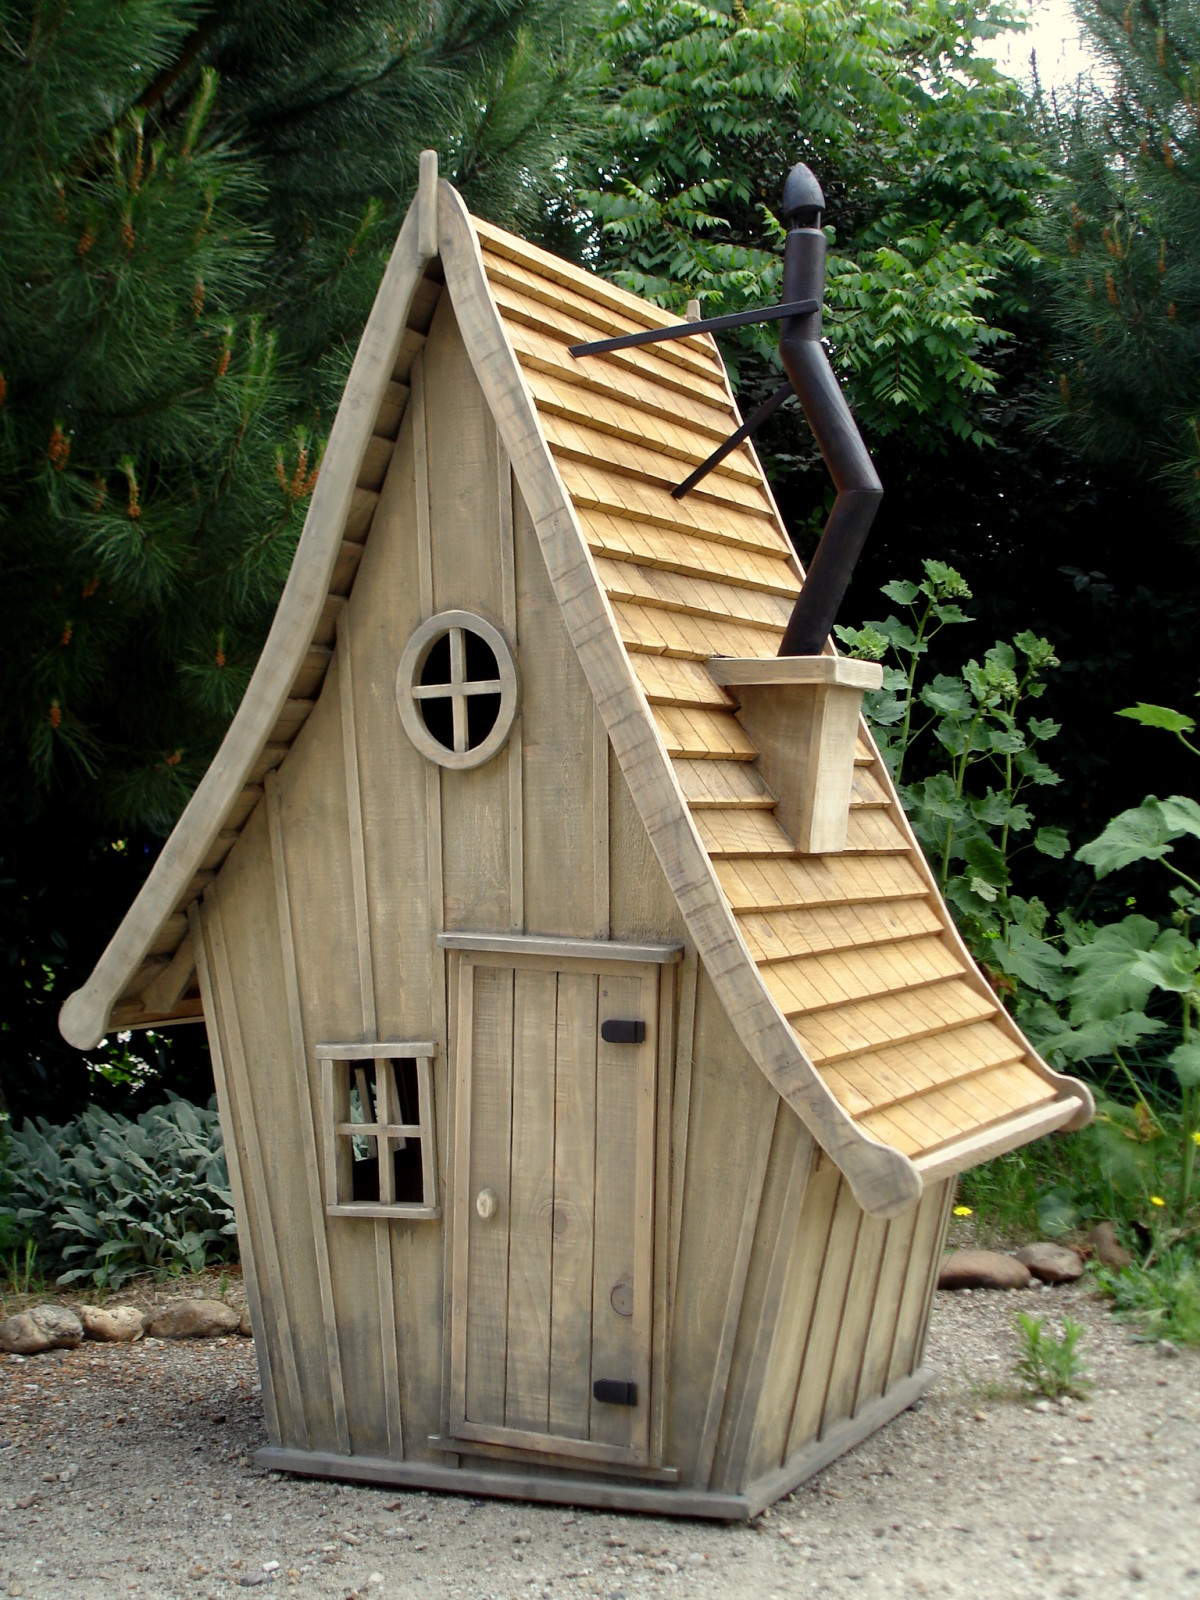 Cabane en bois gratuite - Mailleraye.fr jardin